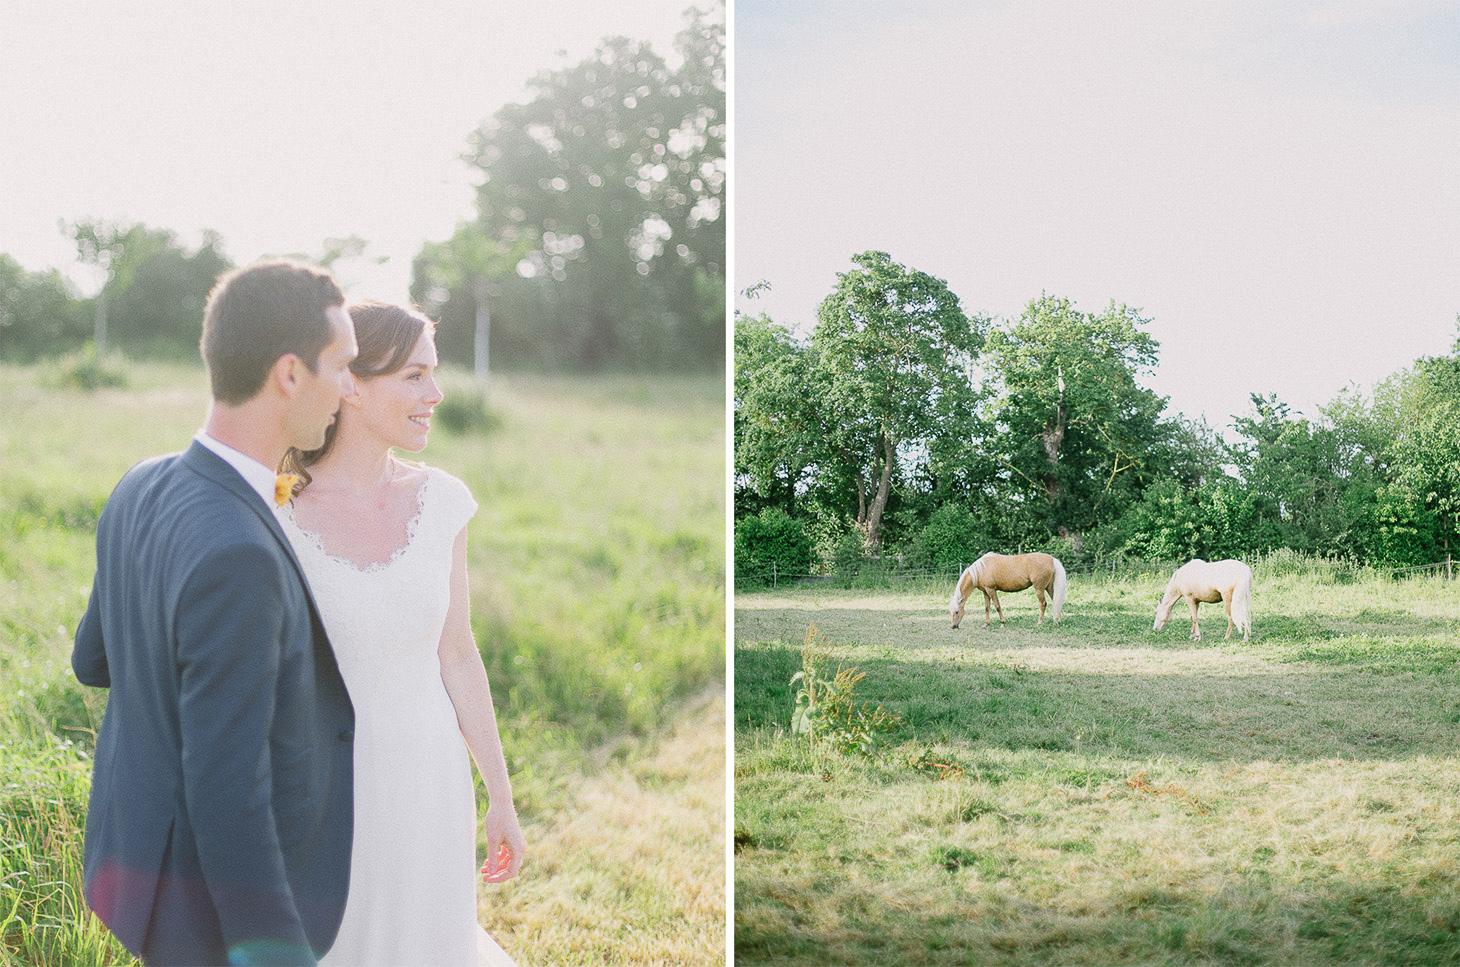 photographe-mariage-champ-de-launay-normandie-00061